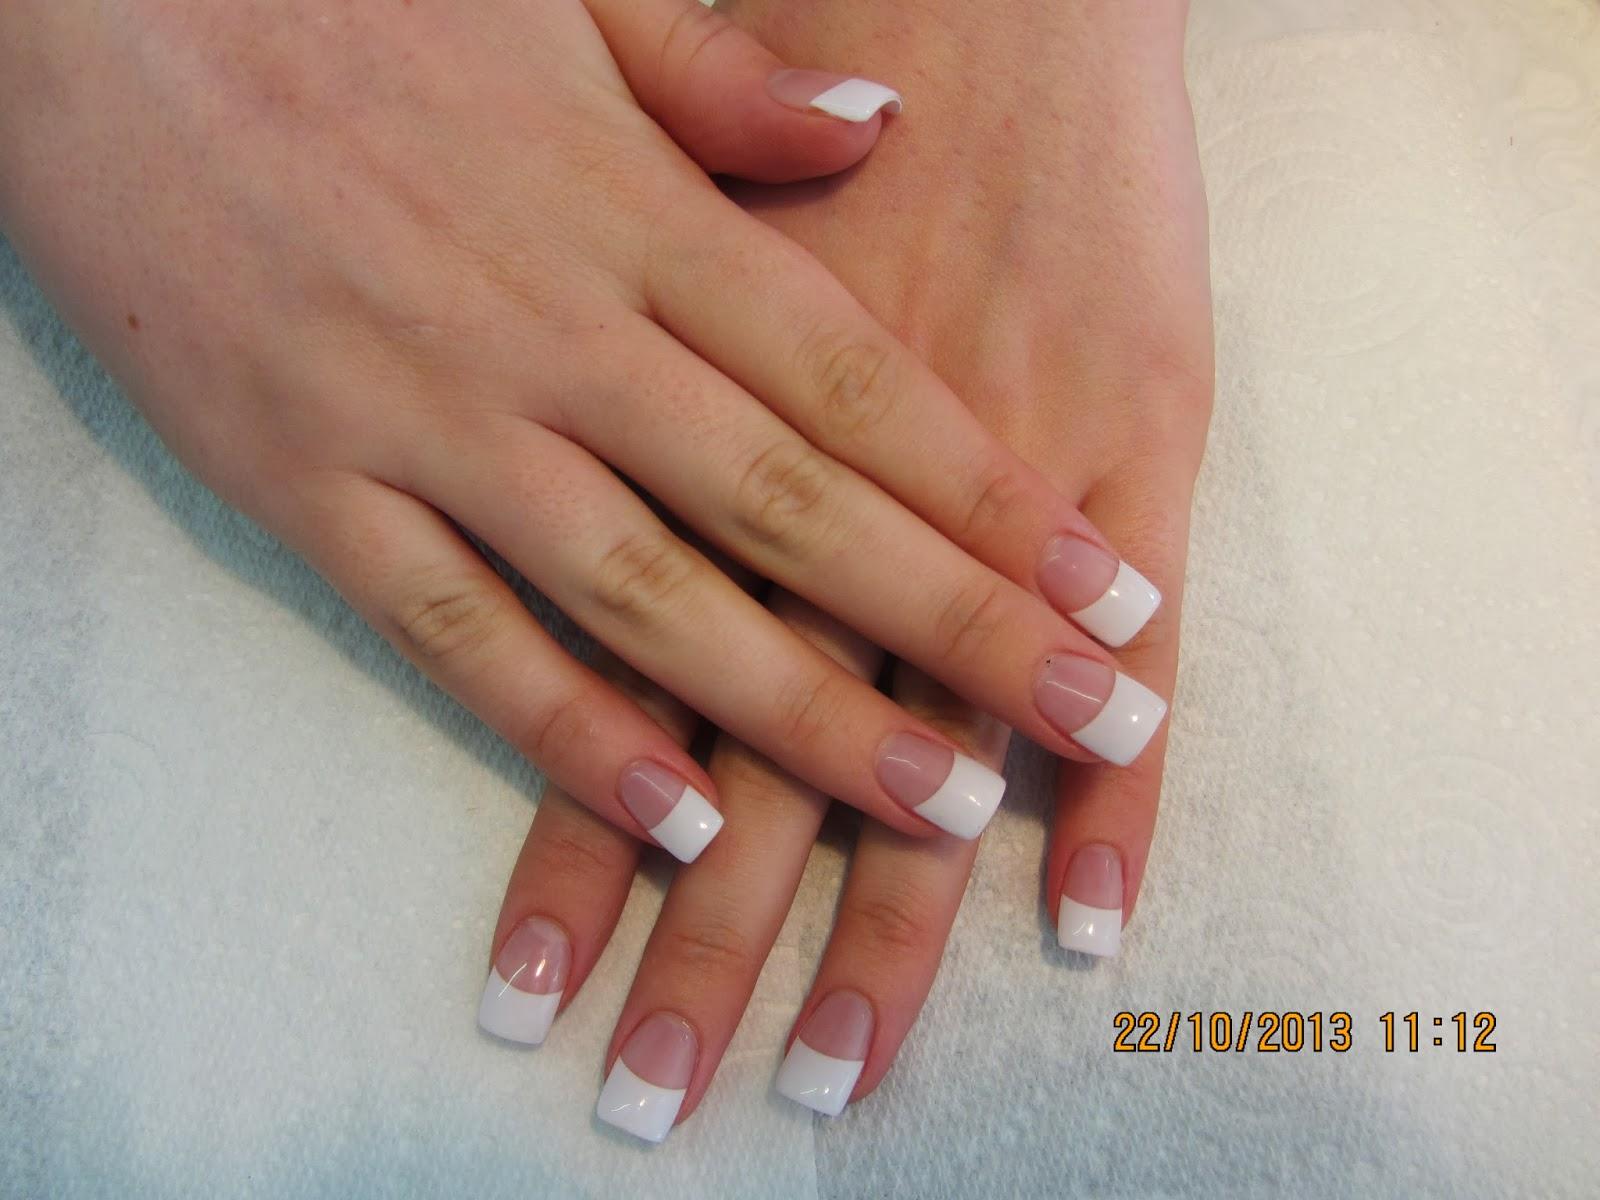 Kim 39 s nails salon acrylic gel nail extensions for Acrylic nail salon